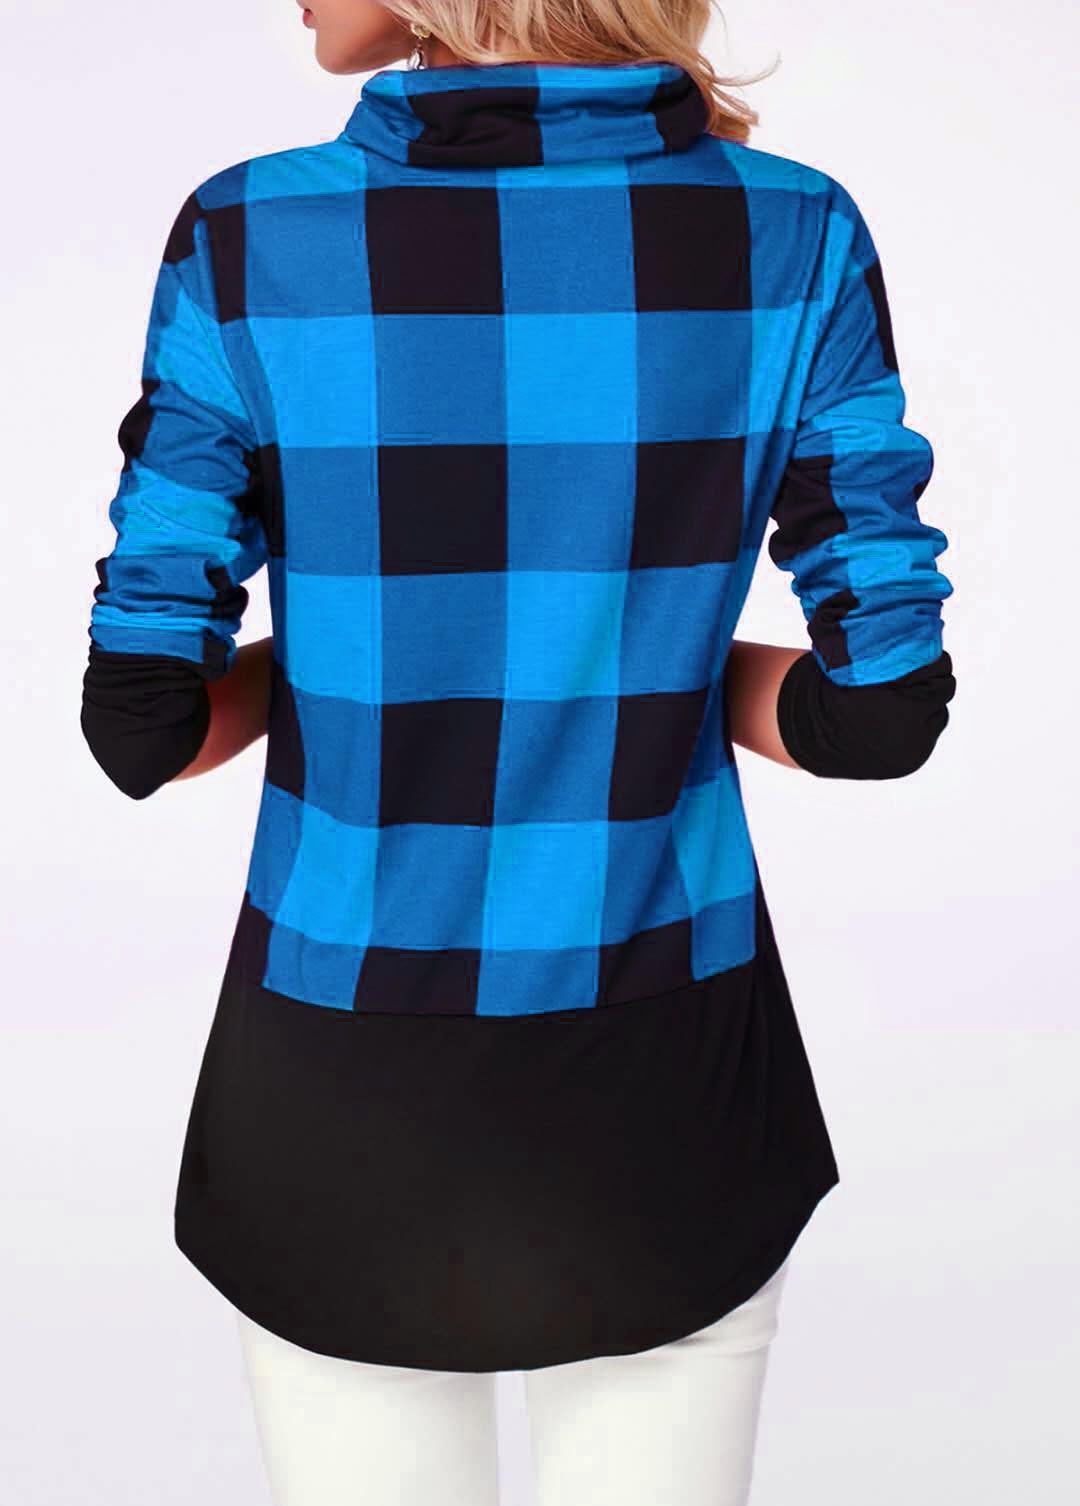 Women's Plaid Print Turtleneck Hoodie, Casual Long Sleeve Women's Plus Size Sweatshirt 11